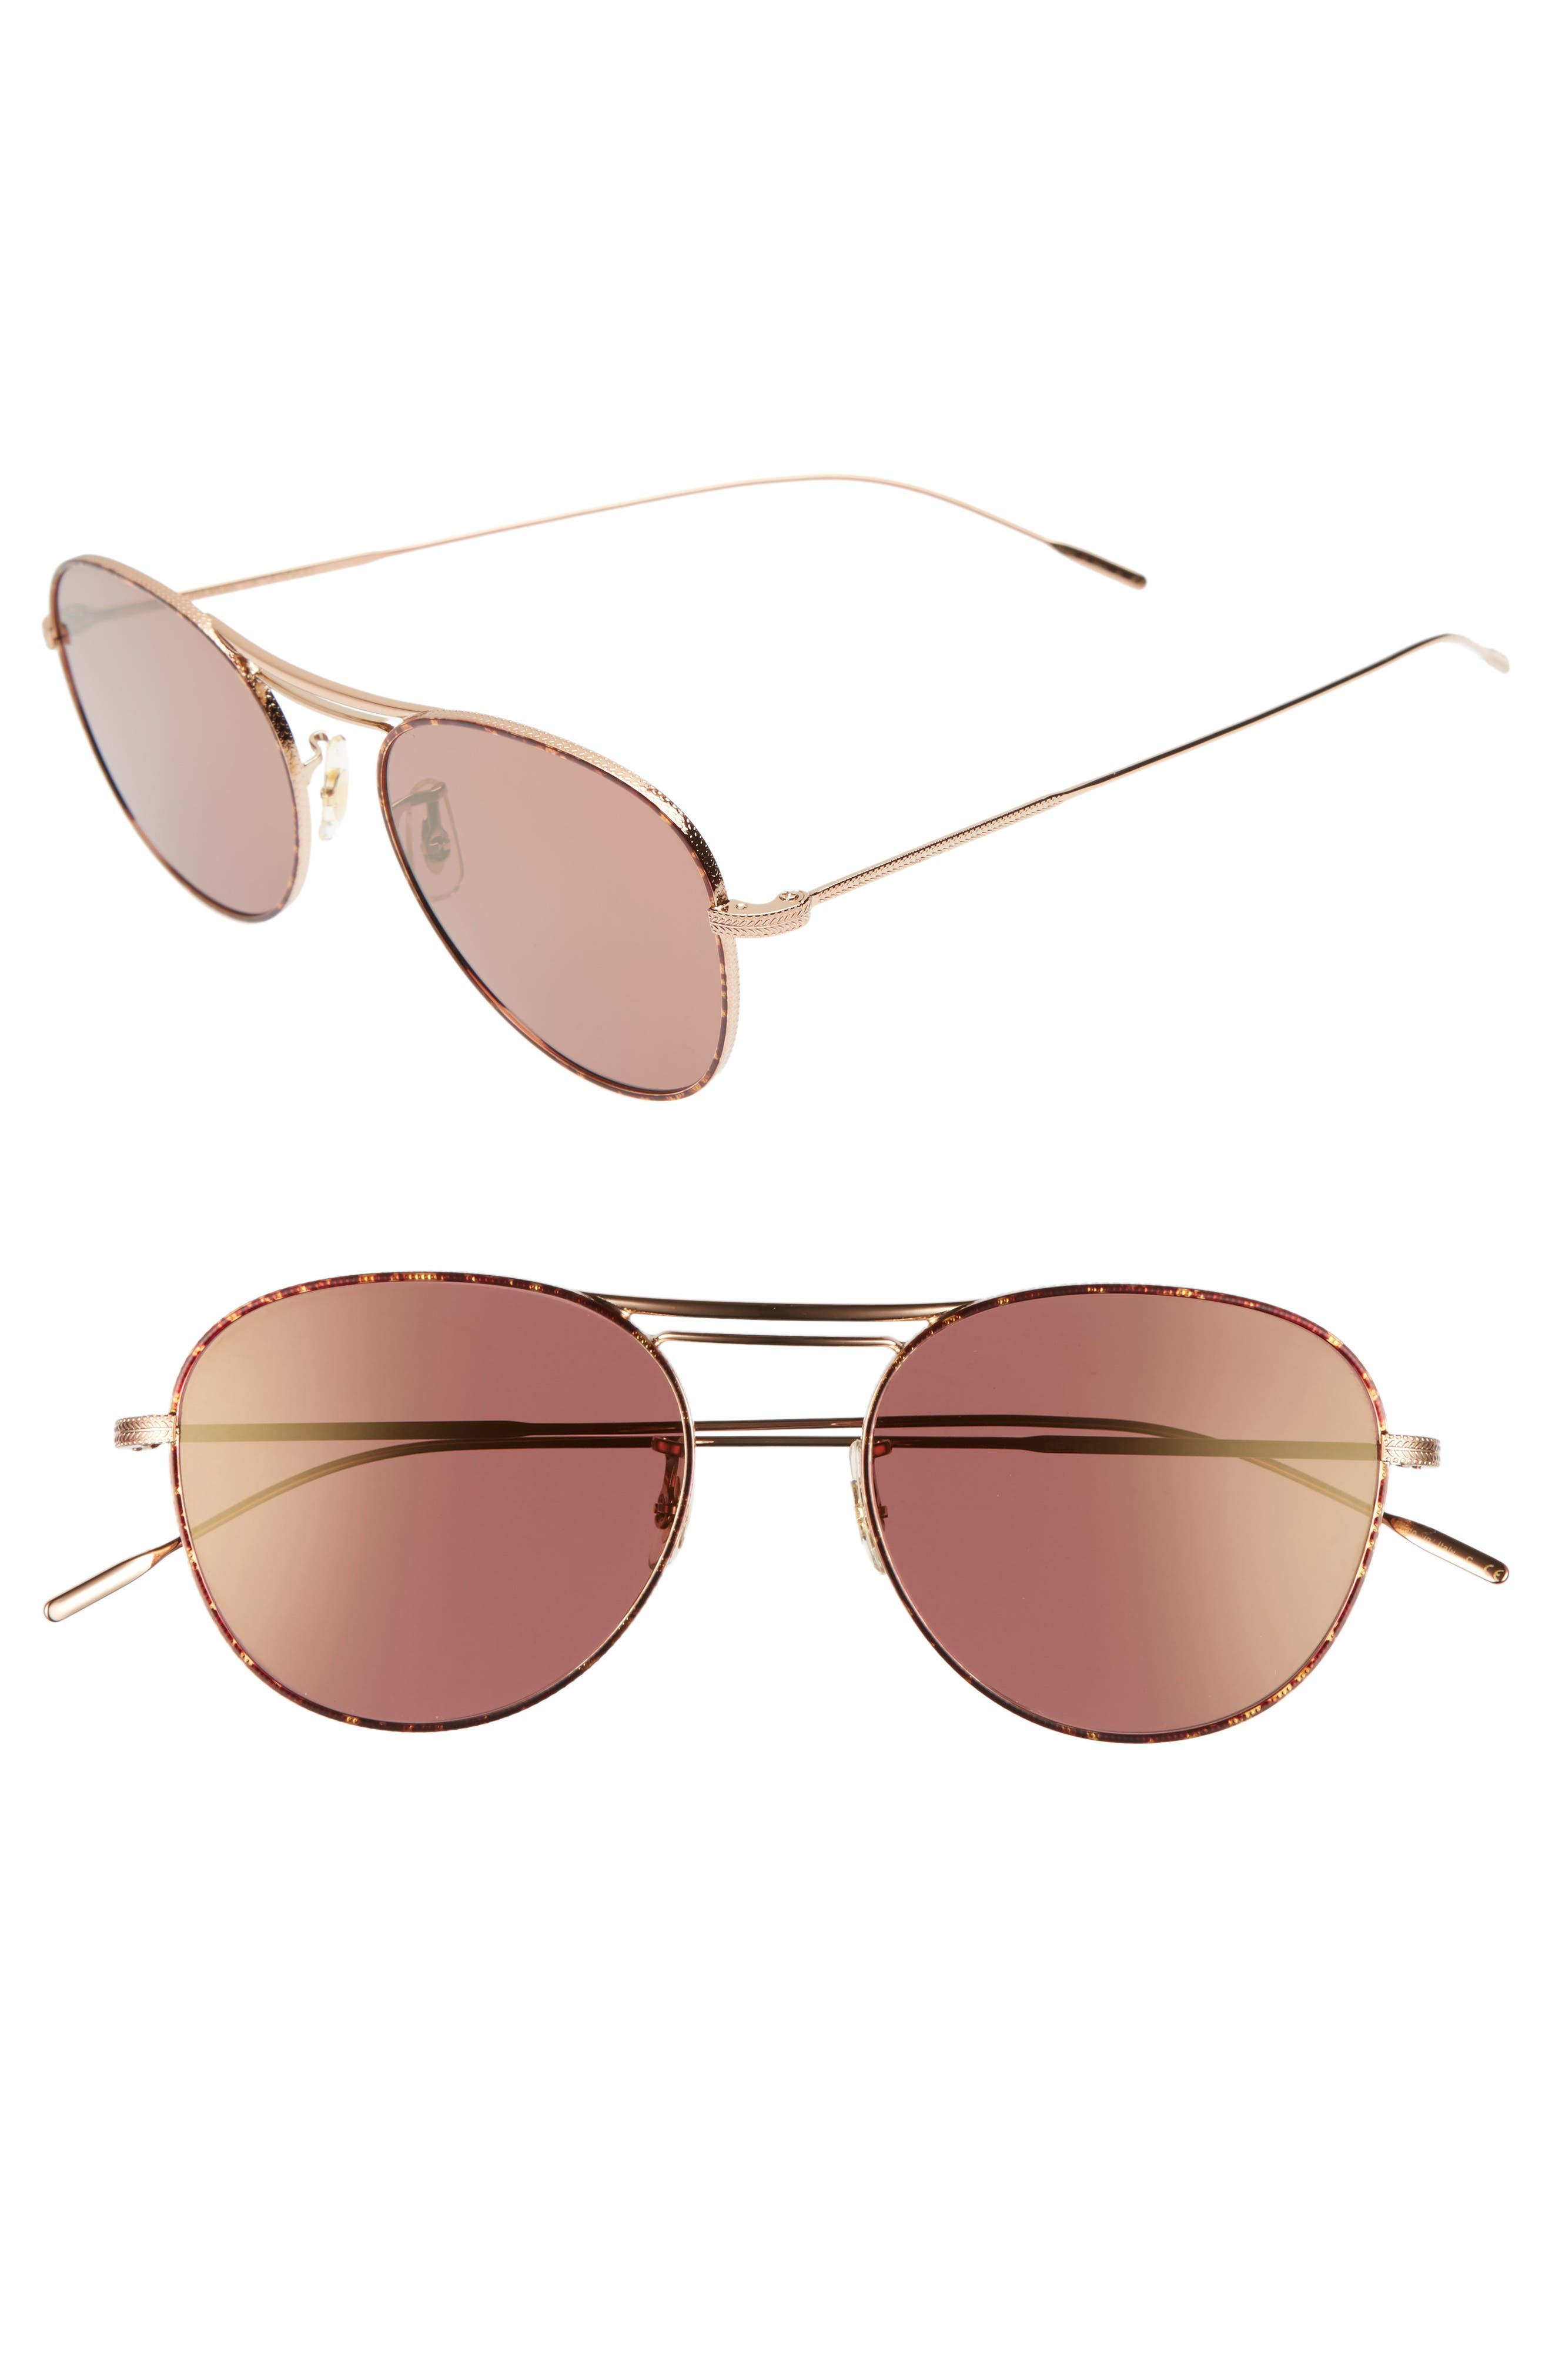 Oliver Peoples Cade 52mm Mirror Lens Aviator Sunglasses